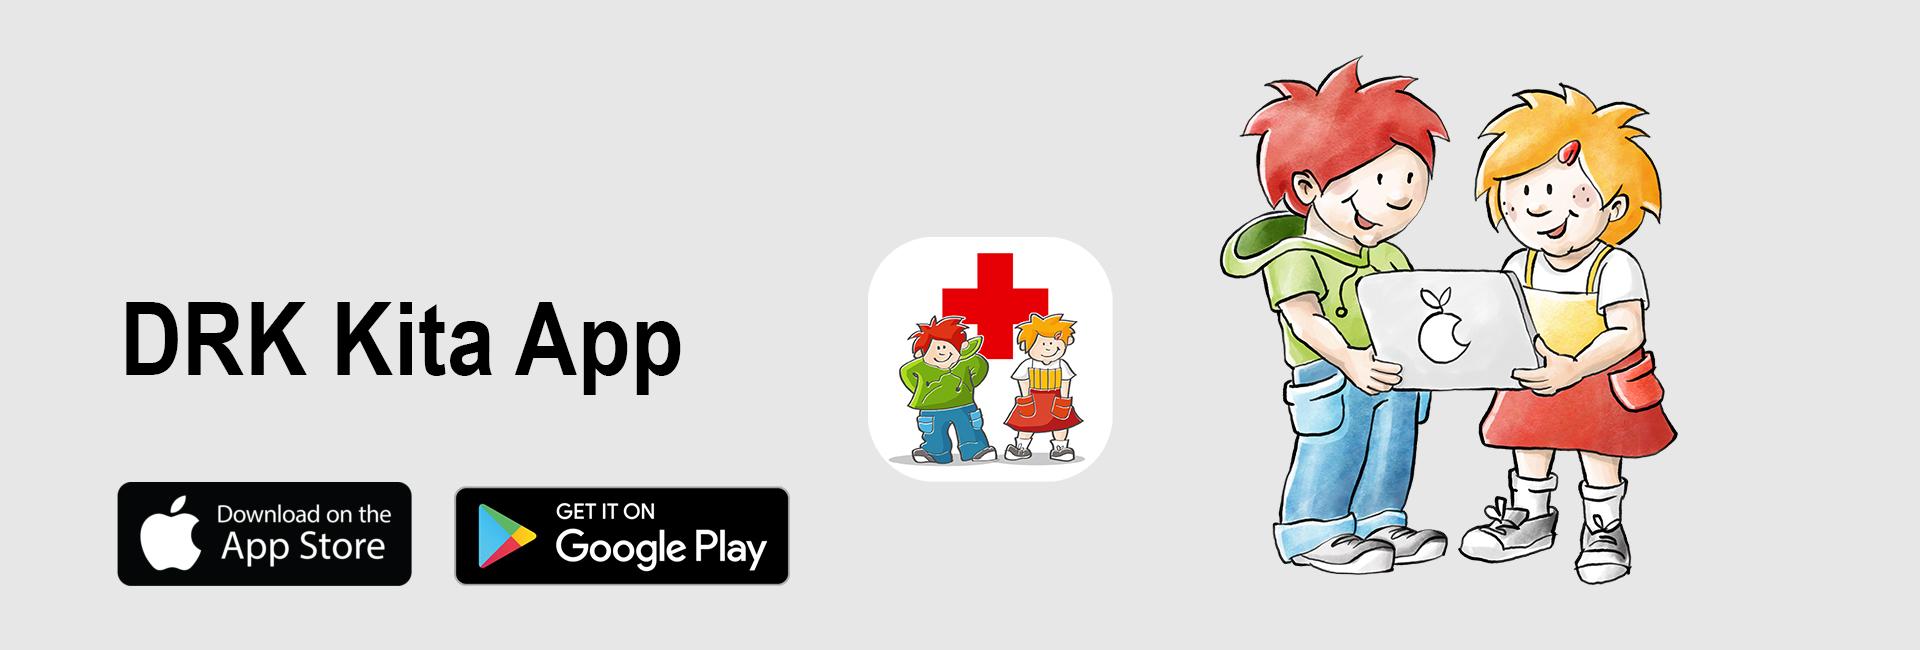 DRK Kita App